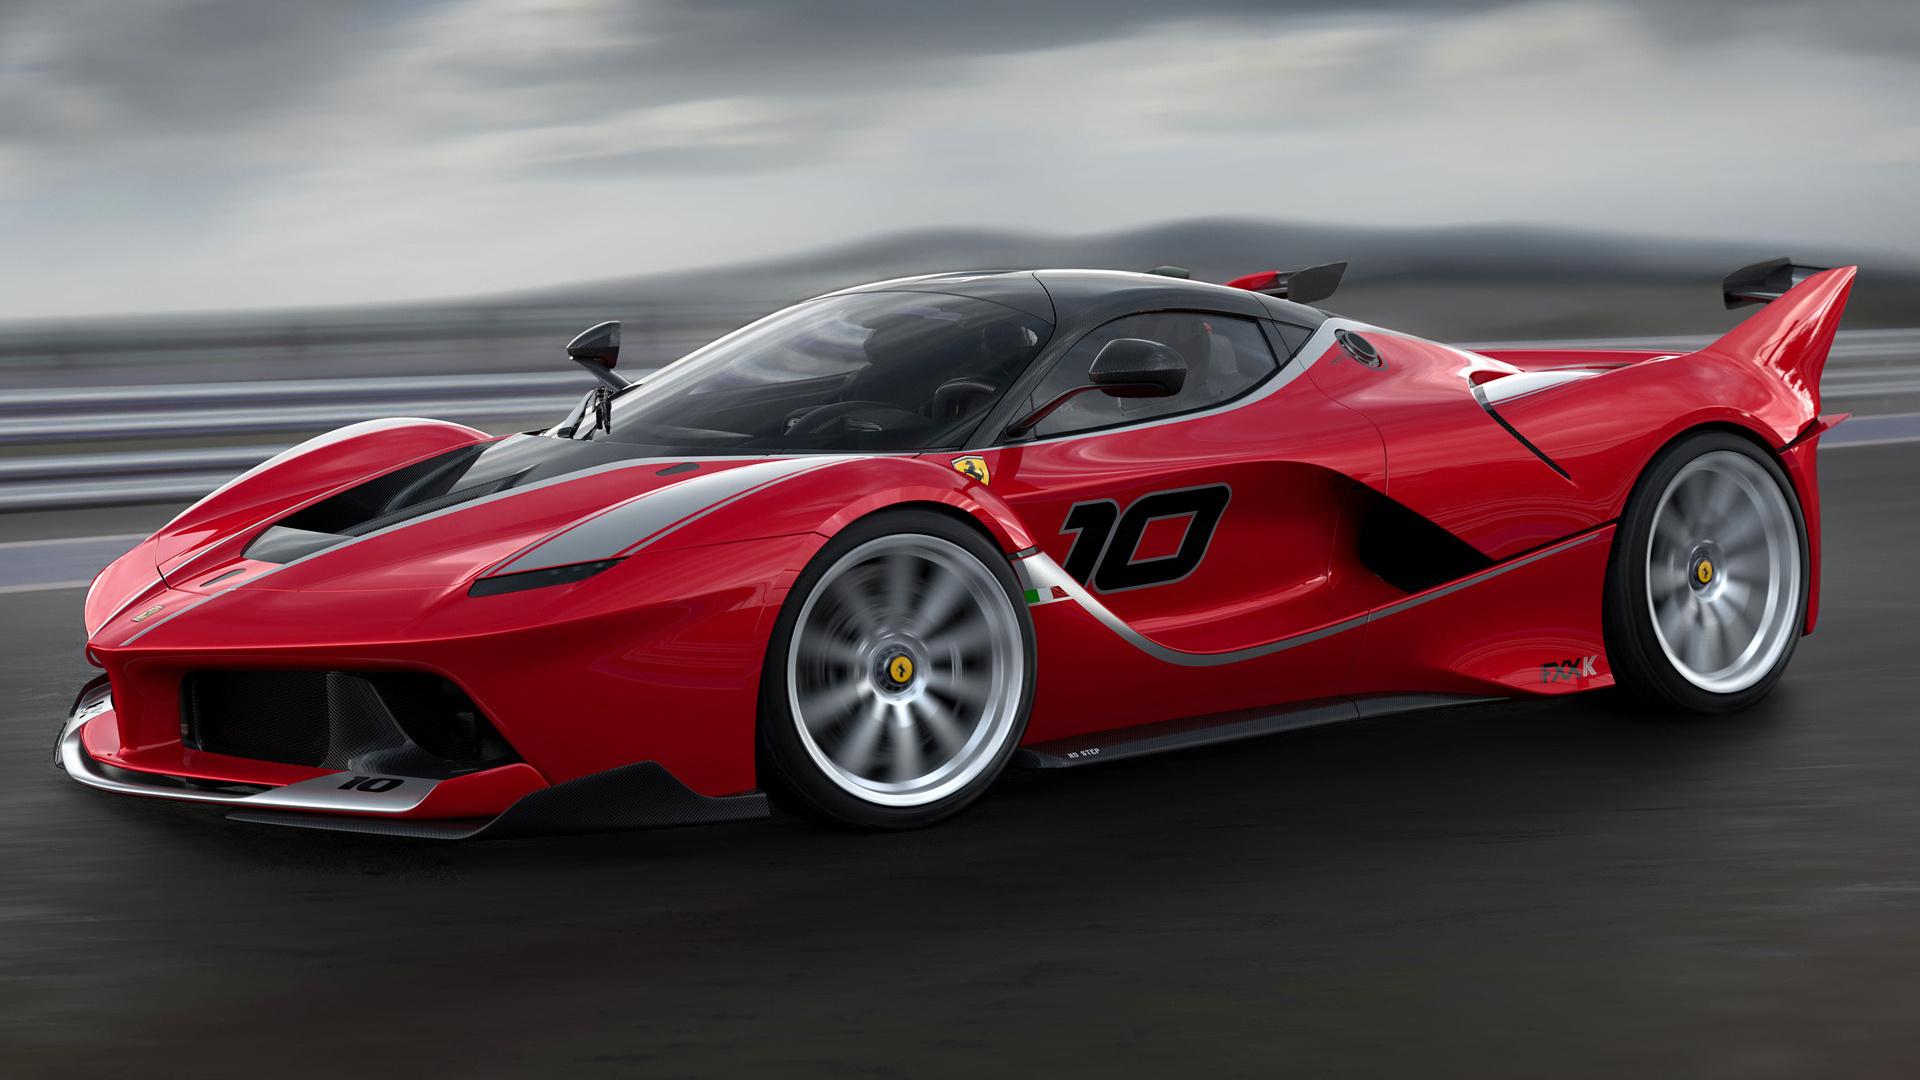 2015 Ferrari FXX K - Wallpapers and HD Images   Car Pixel